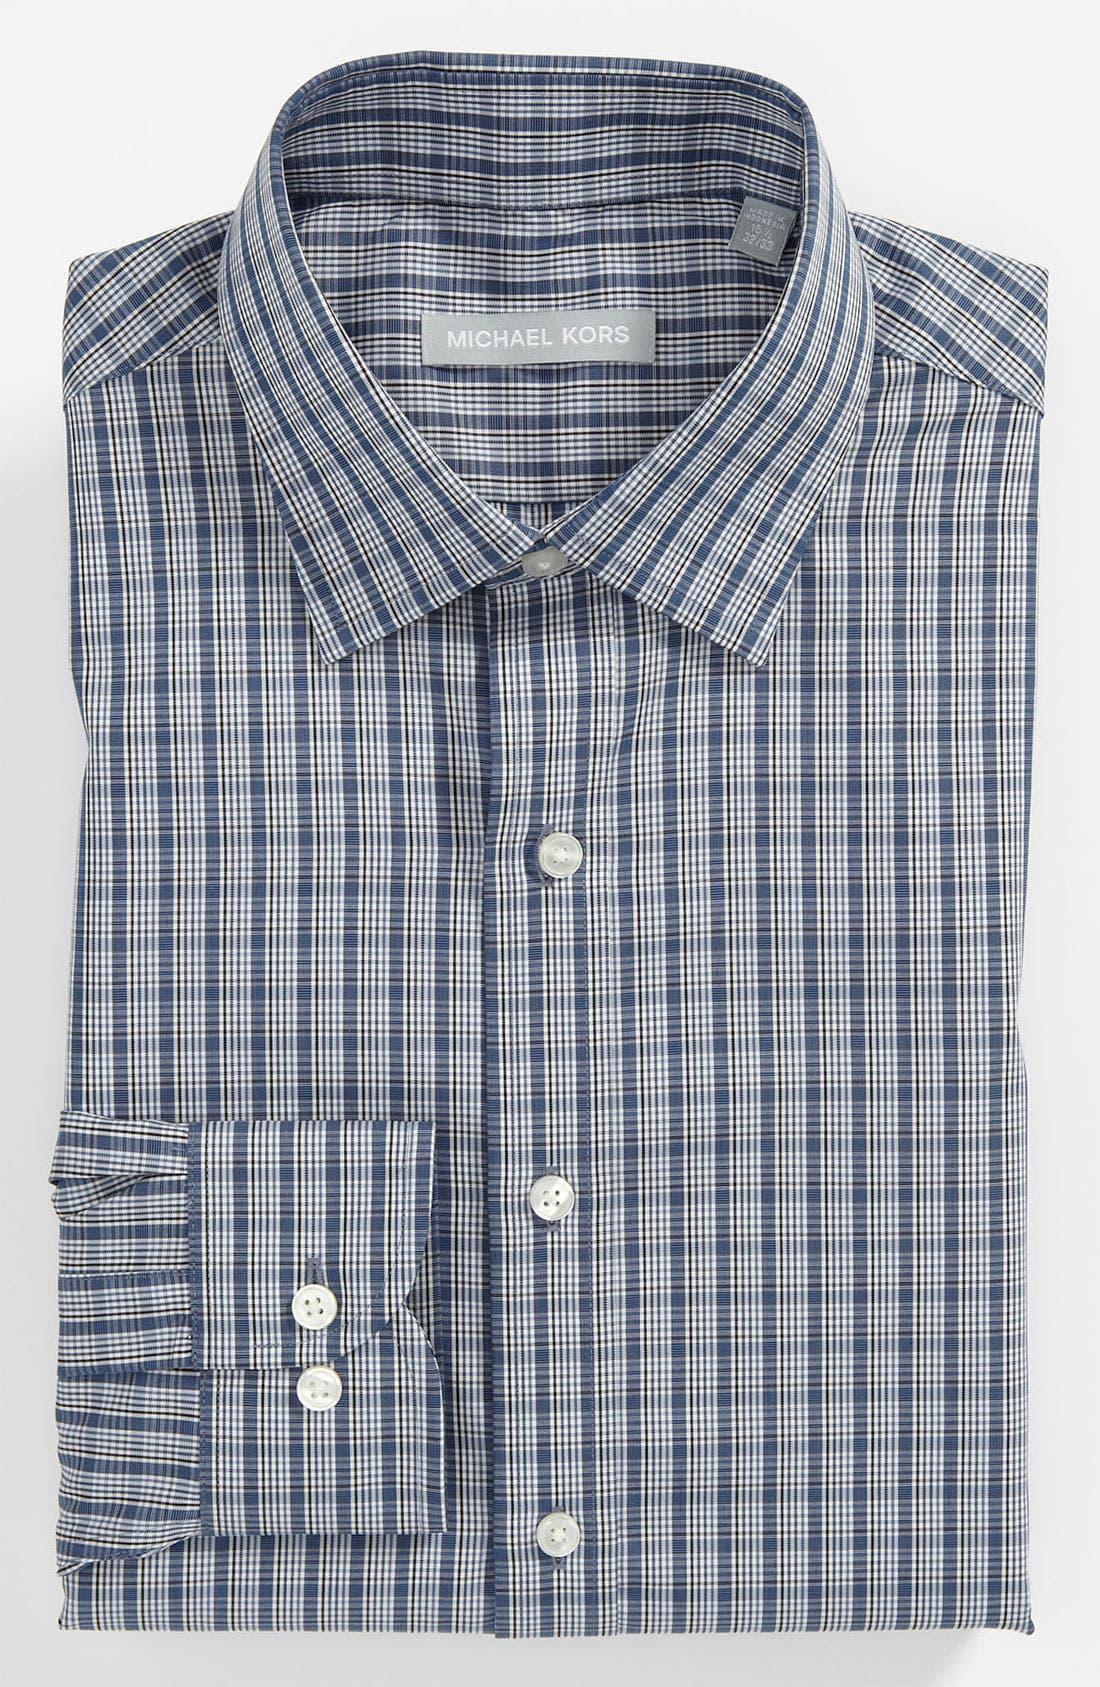 Alternate Image 1 Selected - Michael Kors Regular Fit Dress Shirt